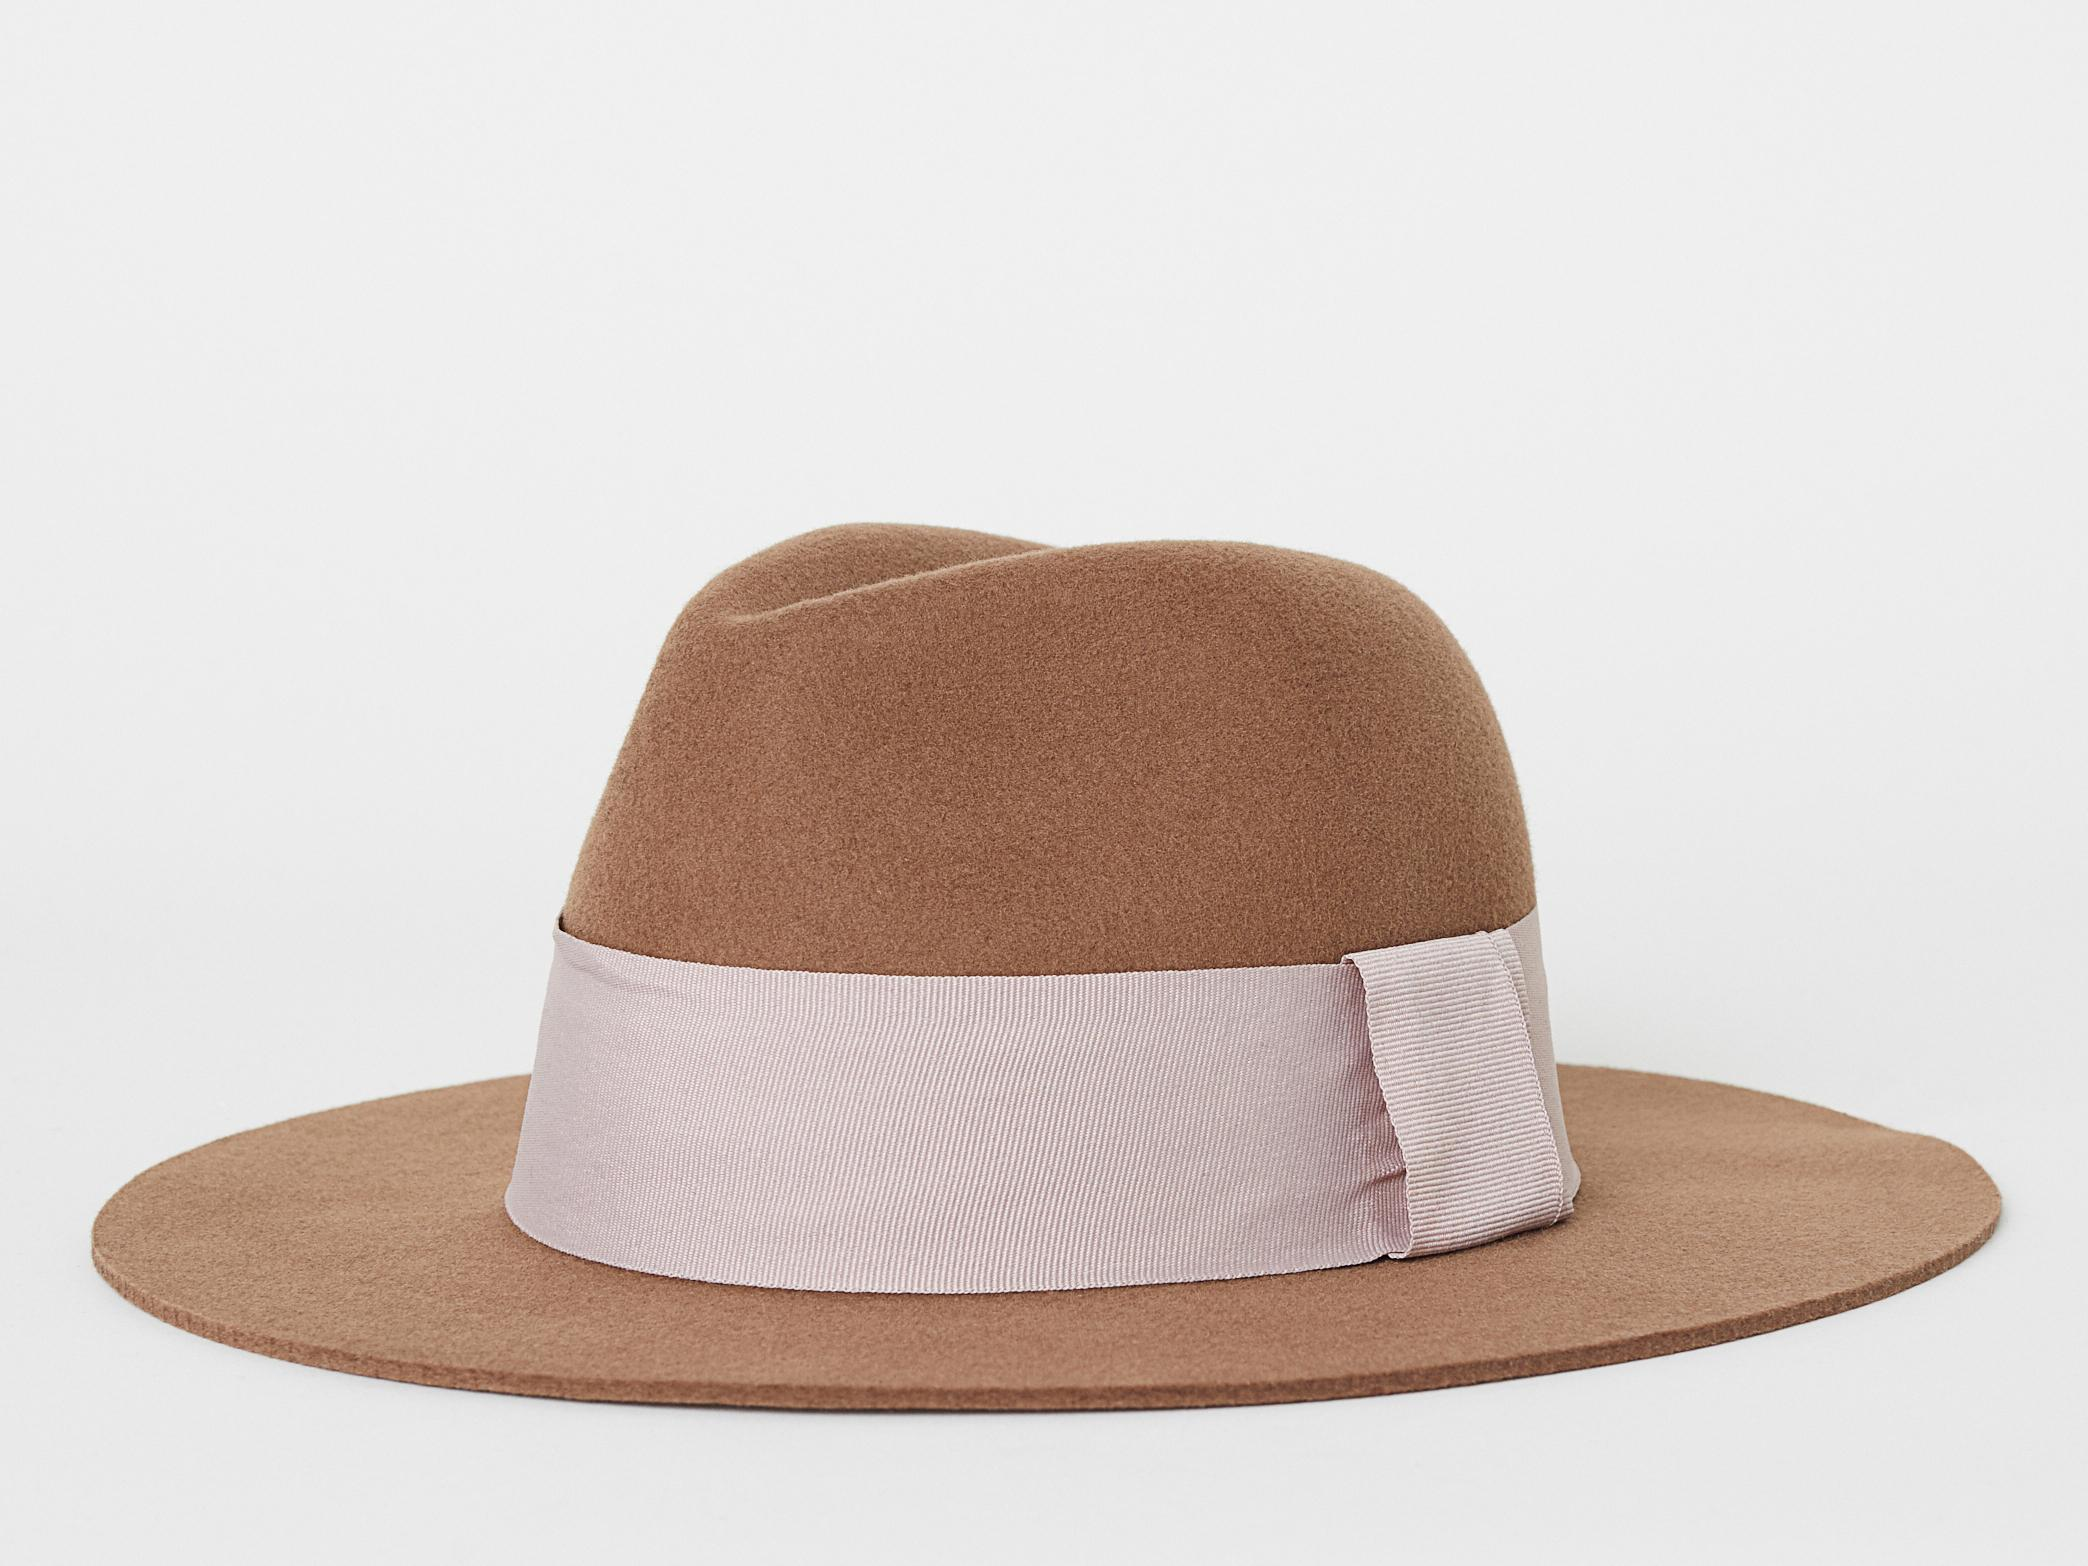 98a40dcf476 13 best winter hats for women